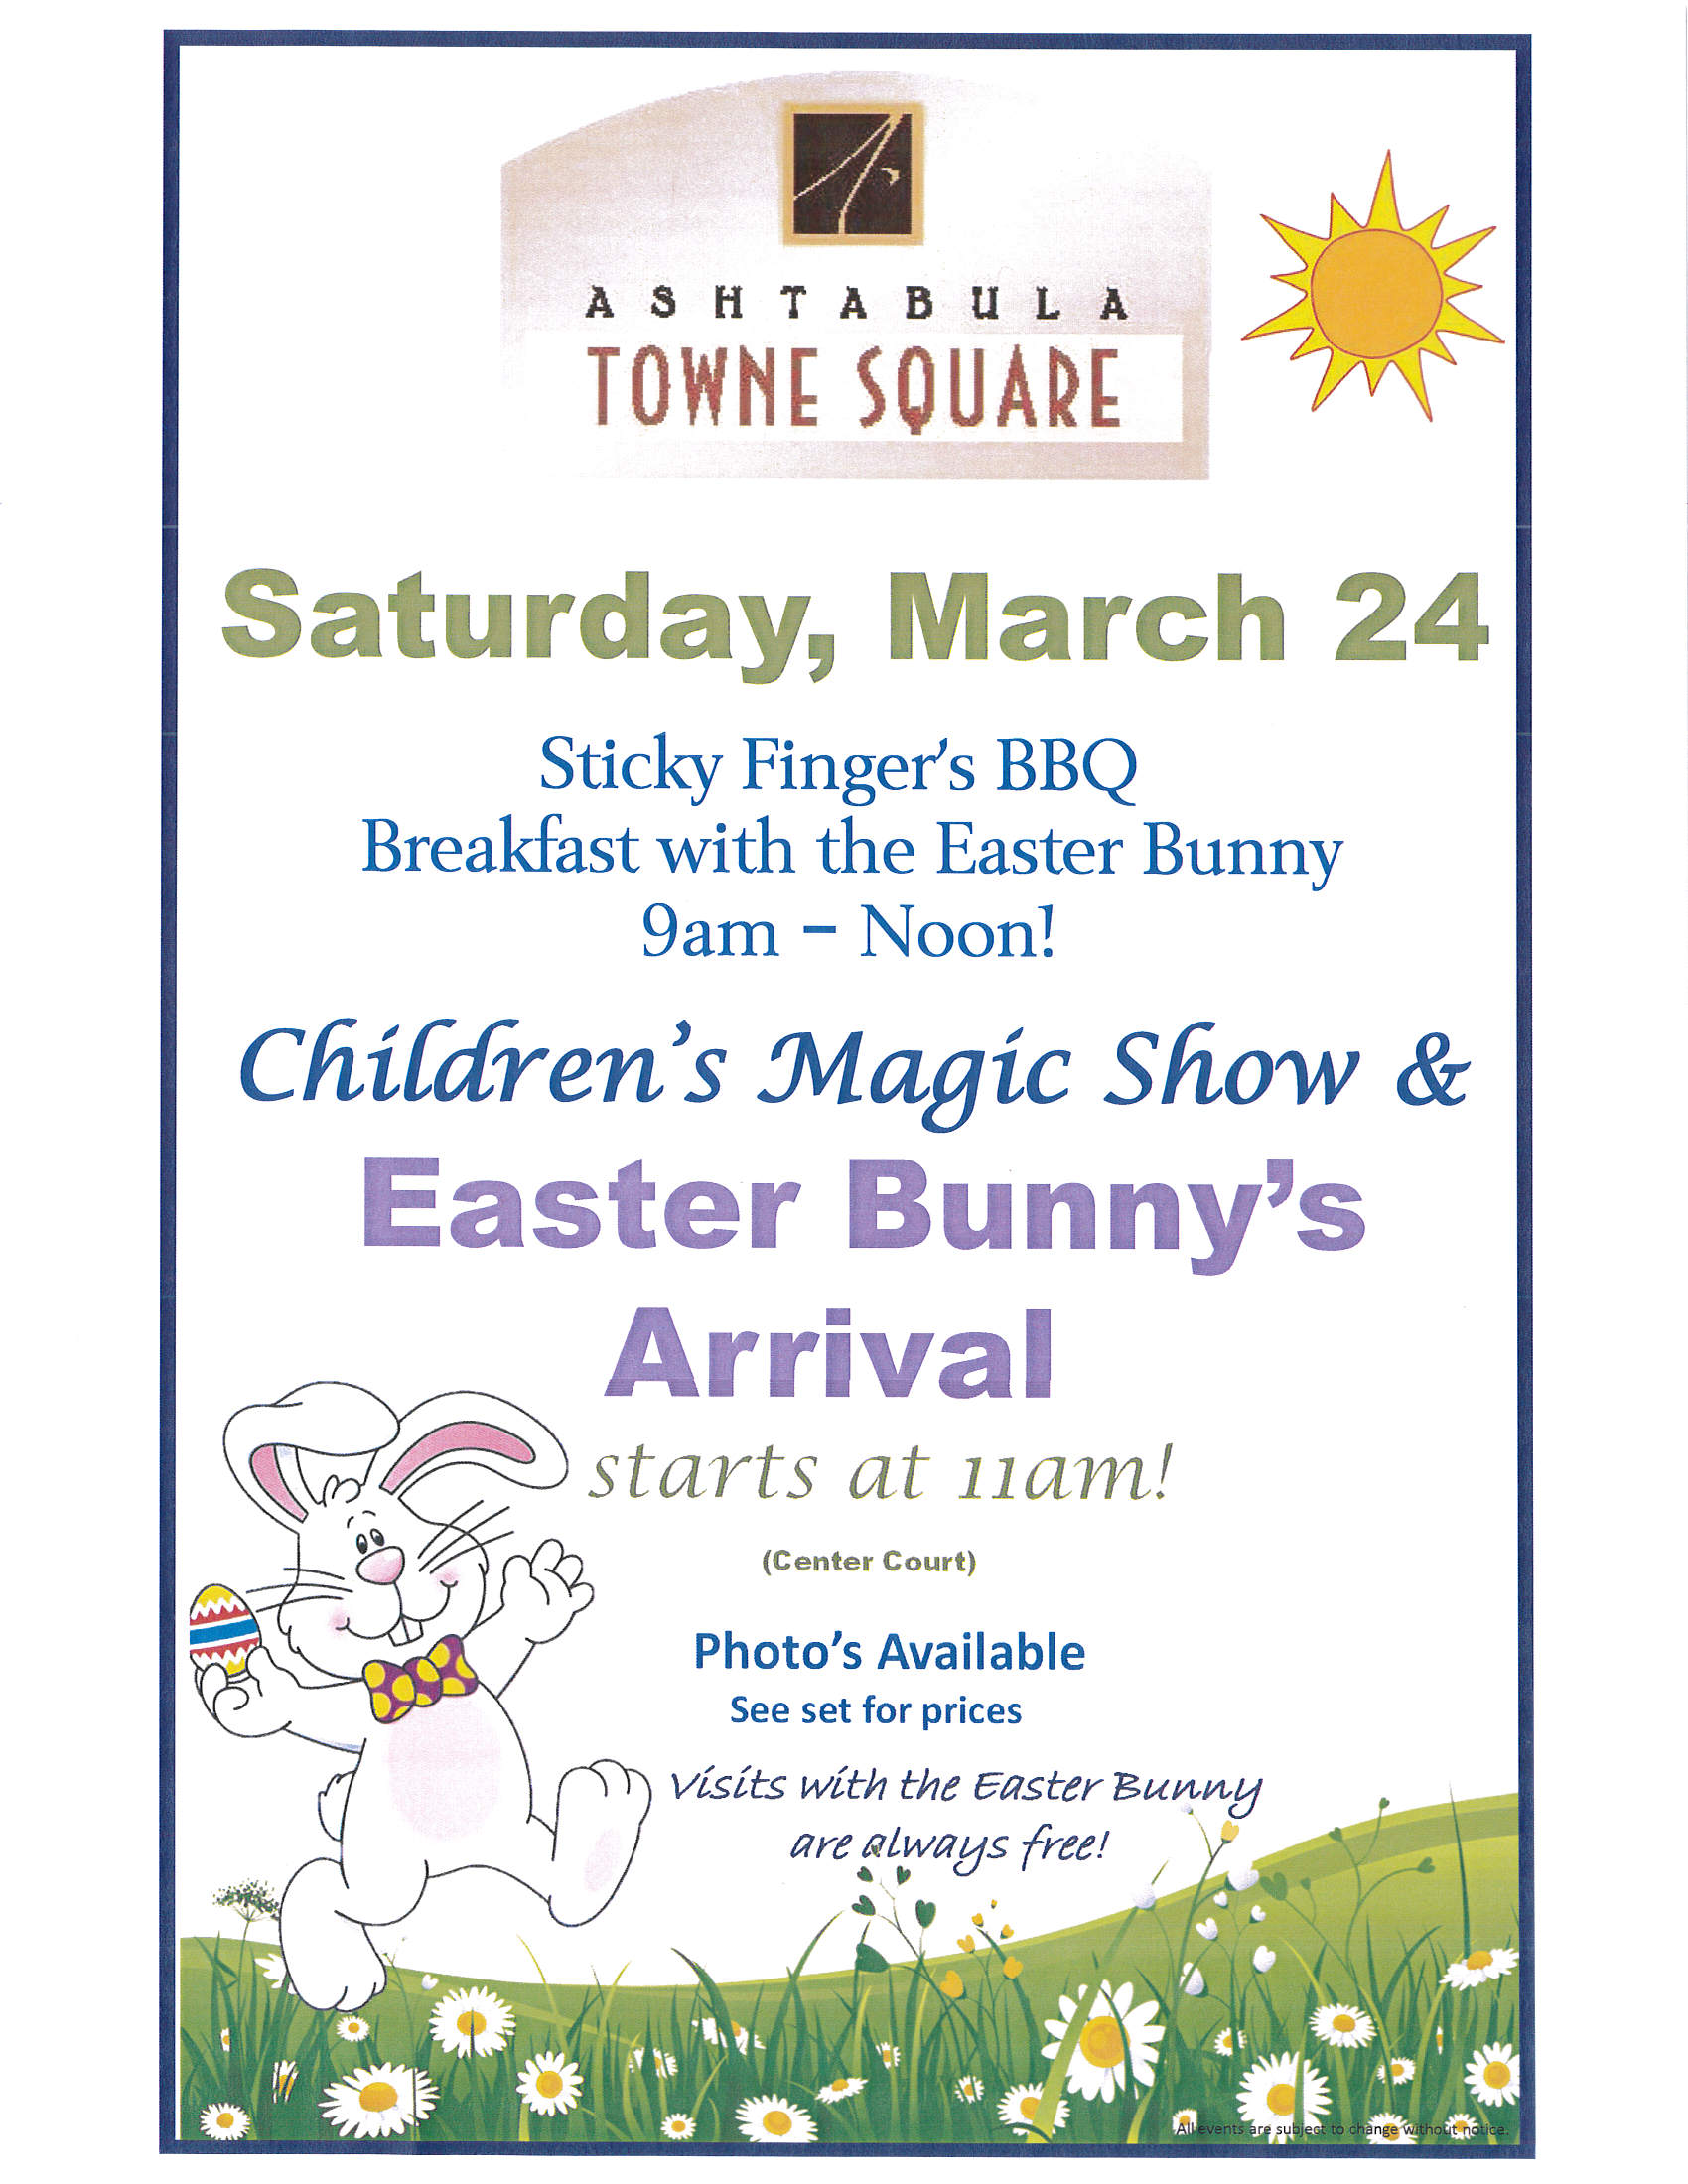 Easter Bunny Arrival 03.jpg